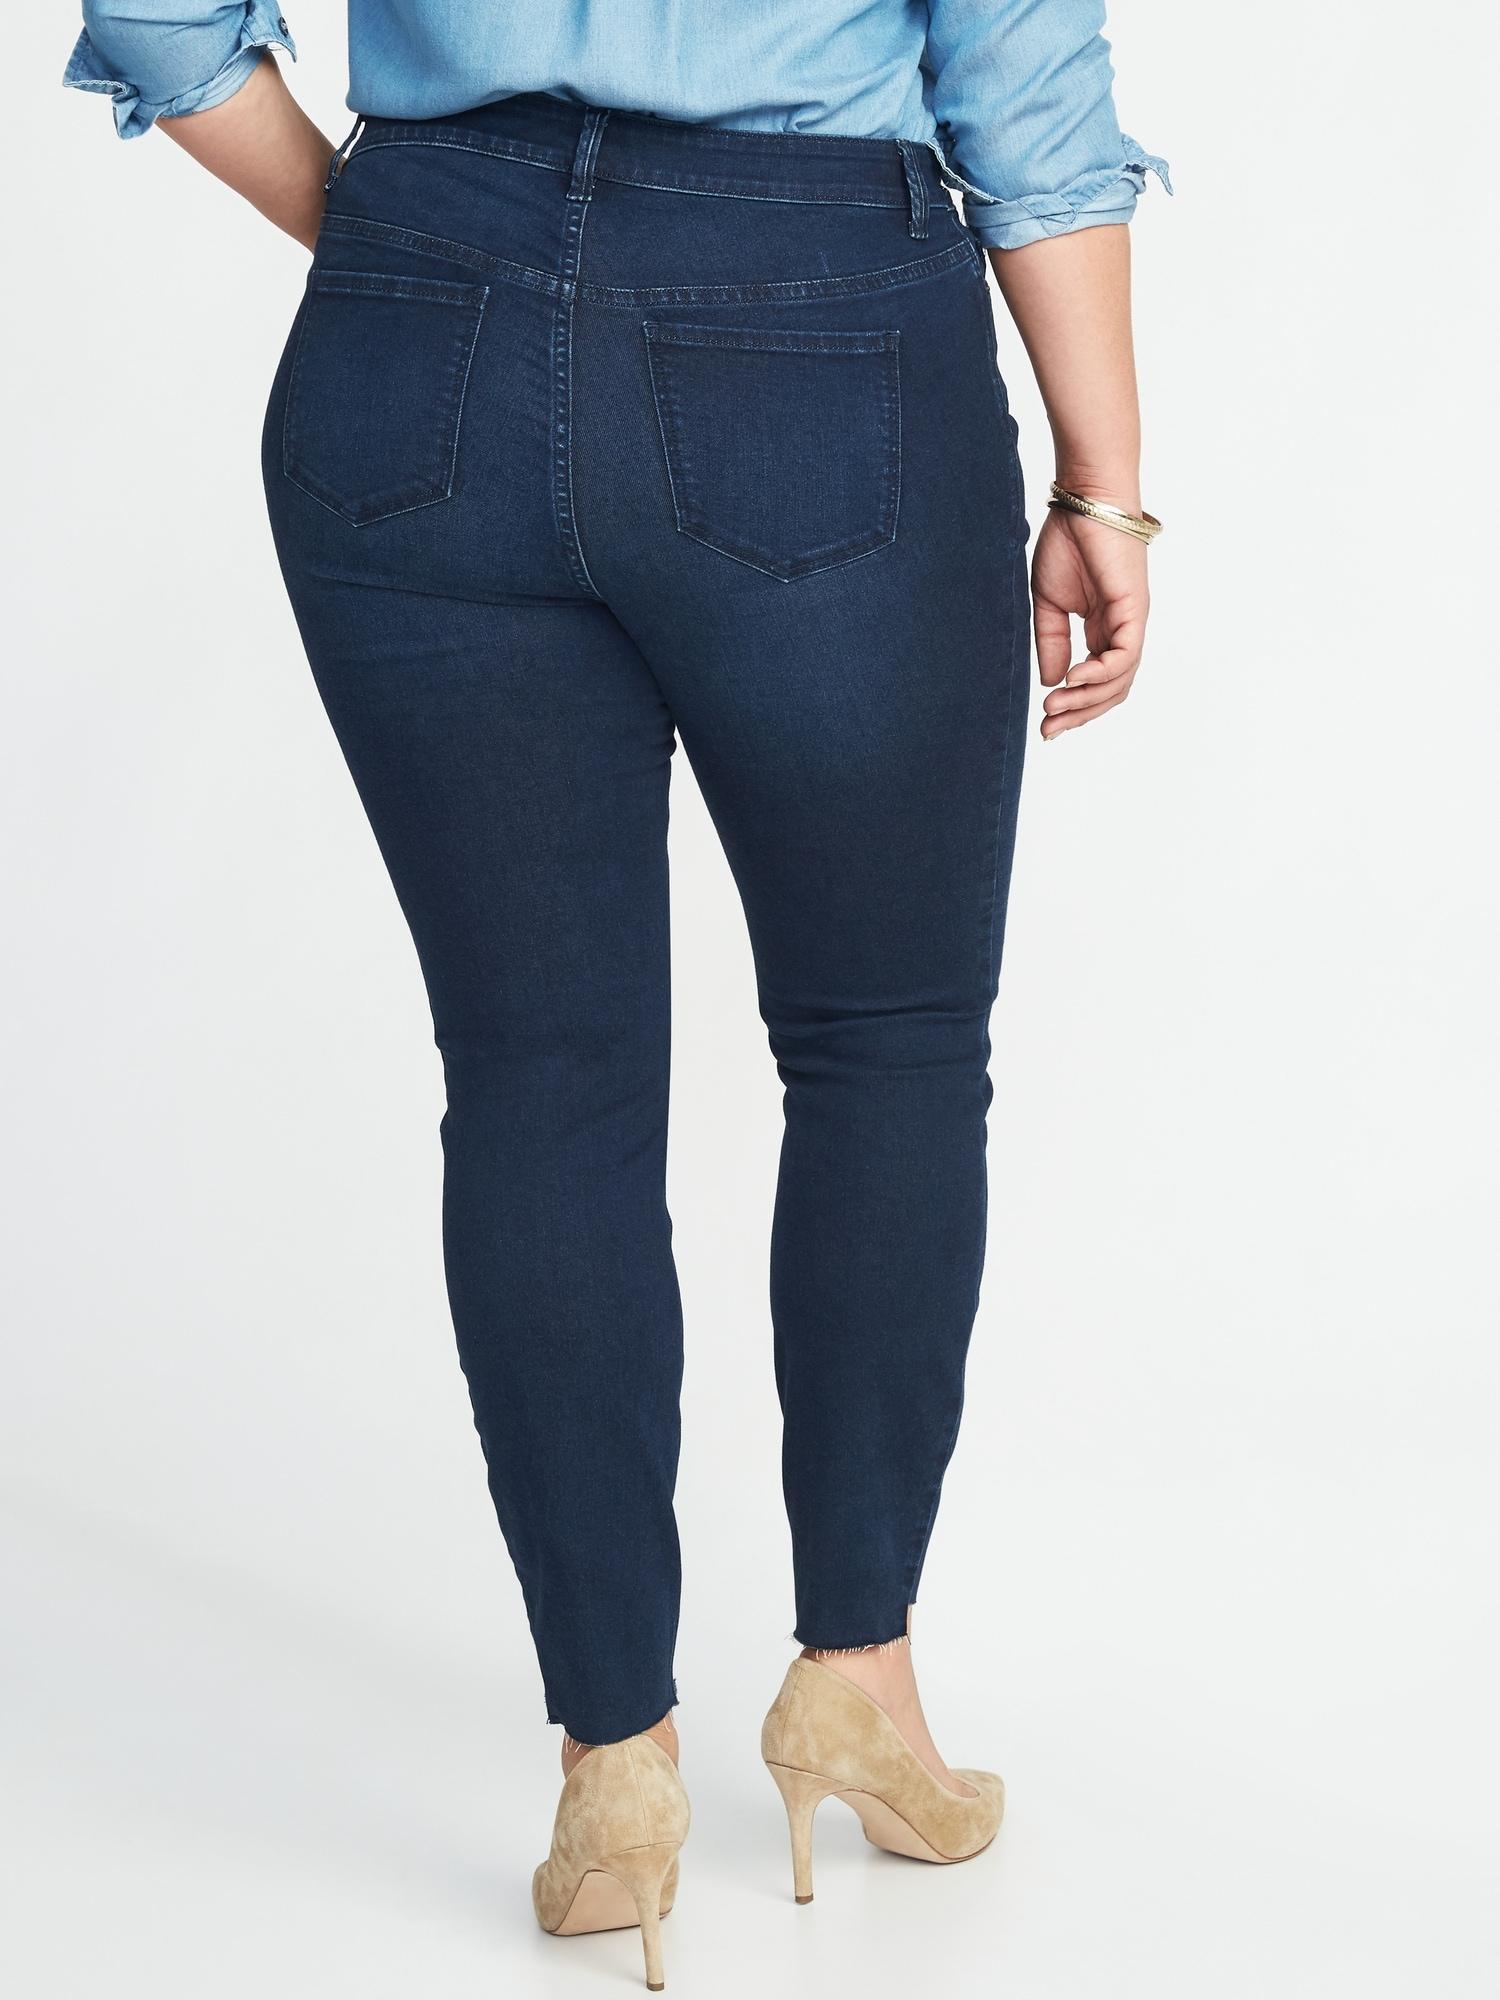 10d7dddc2026a2 Old Navy High-rise Secret-slim Pockets Plus-size Step-hem Rockstar Jeans in  Blue - Lyst